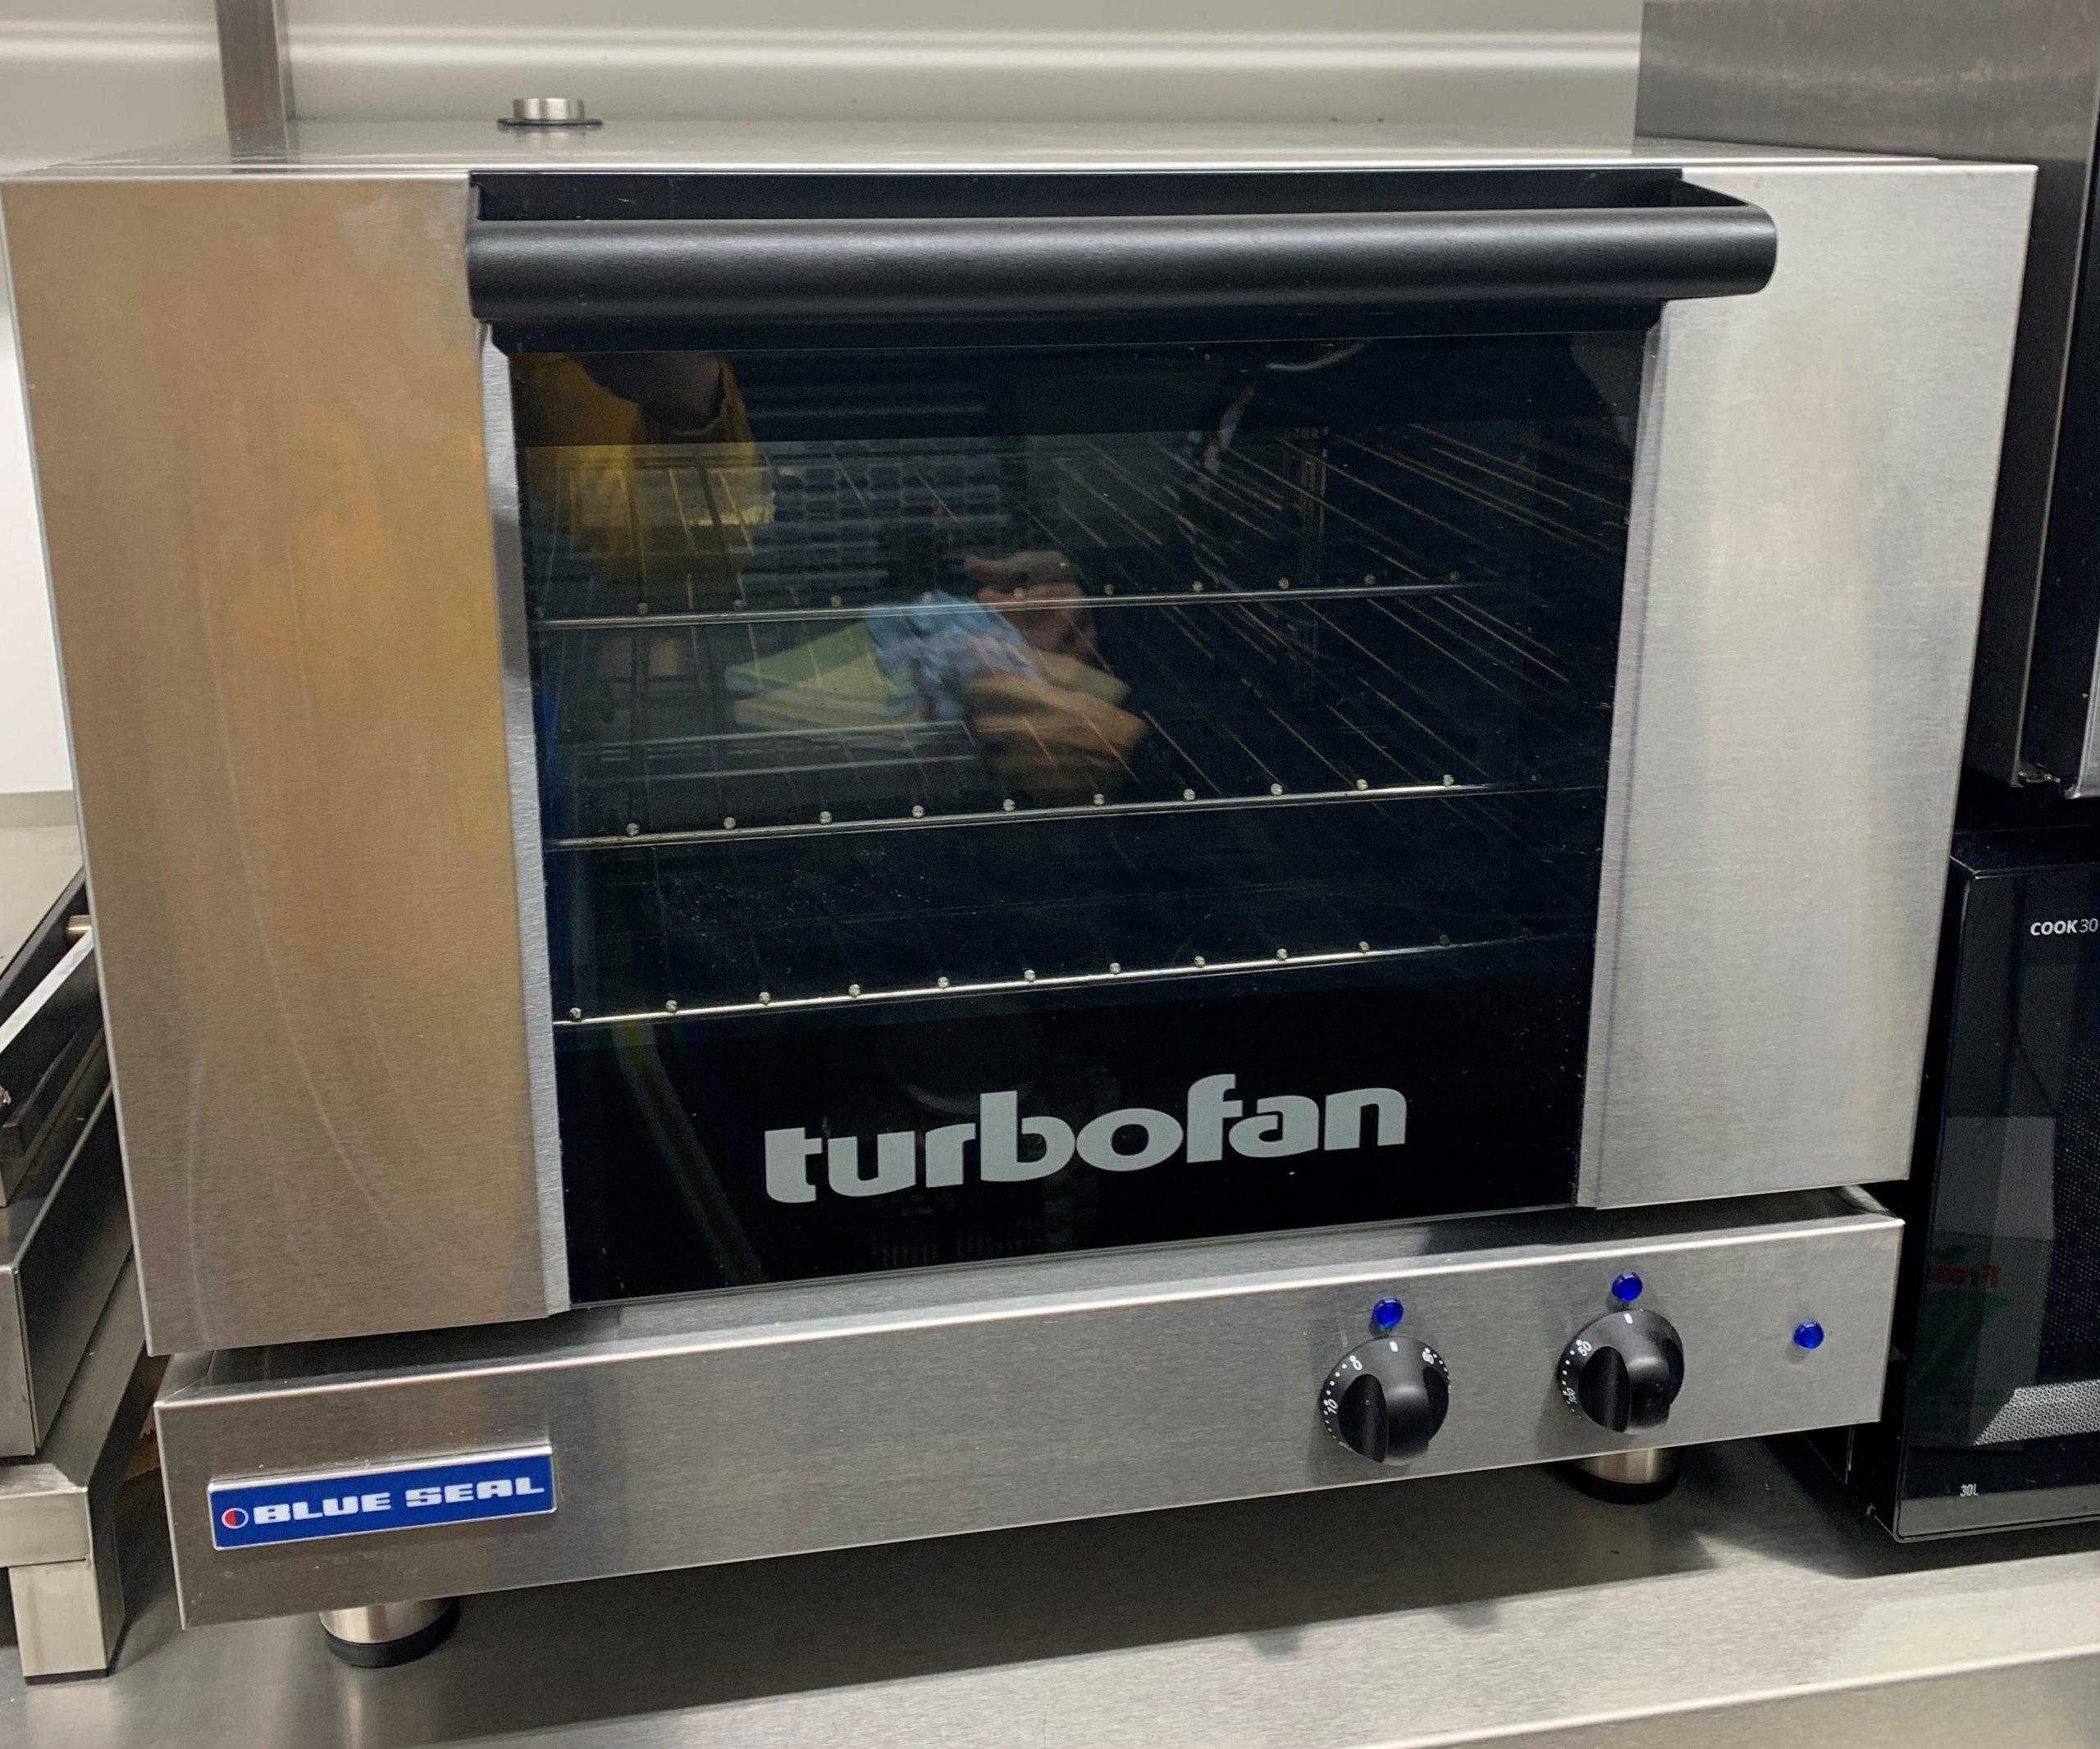 BLUE SEAL E22D Electric Convection Oven